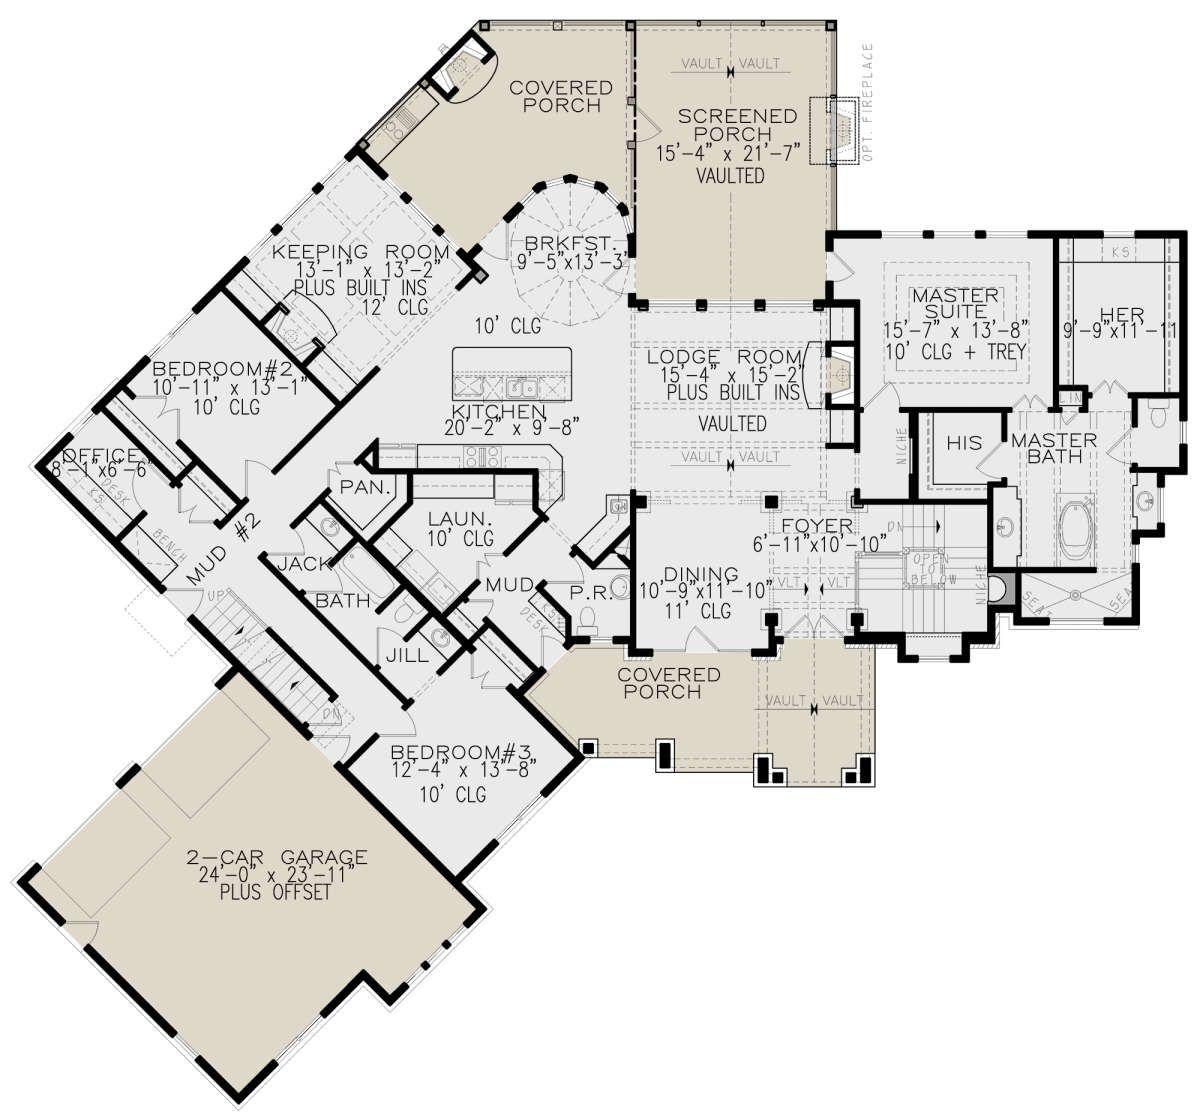 House Plan 20 20   Lake Front Plan 20,20 Square Feet, 20 20 ...